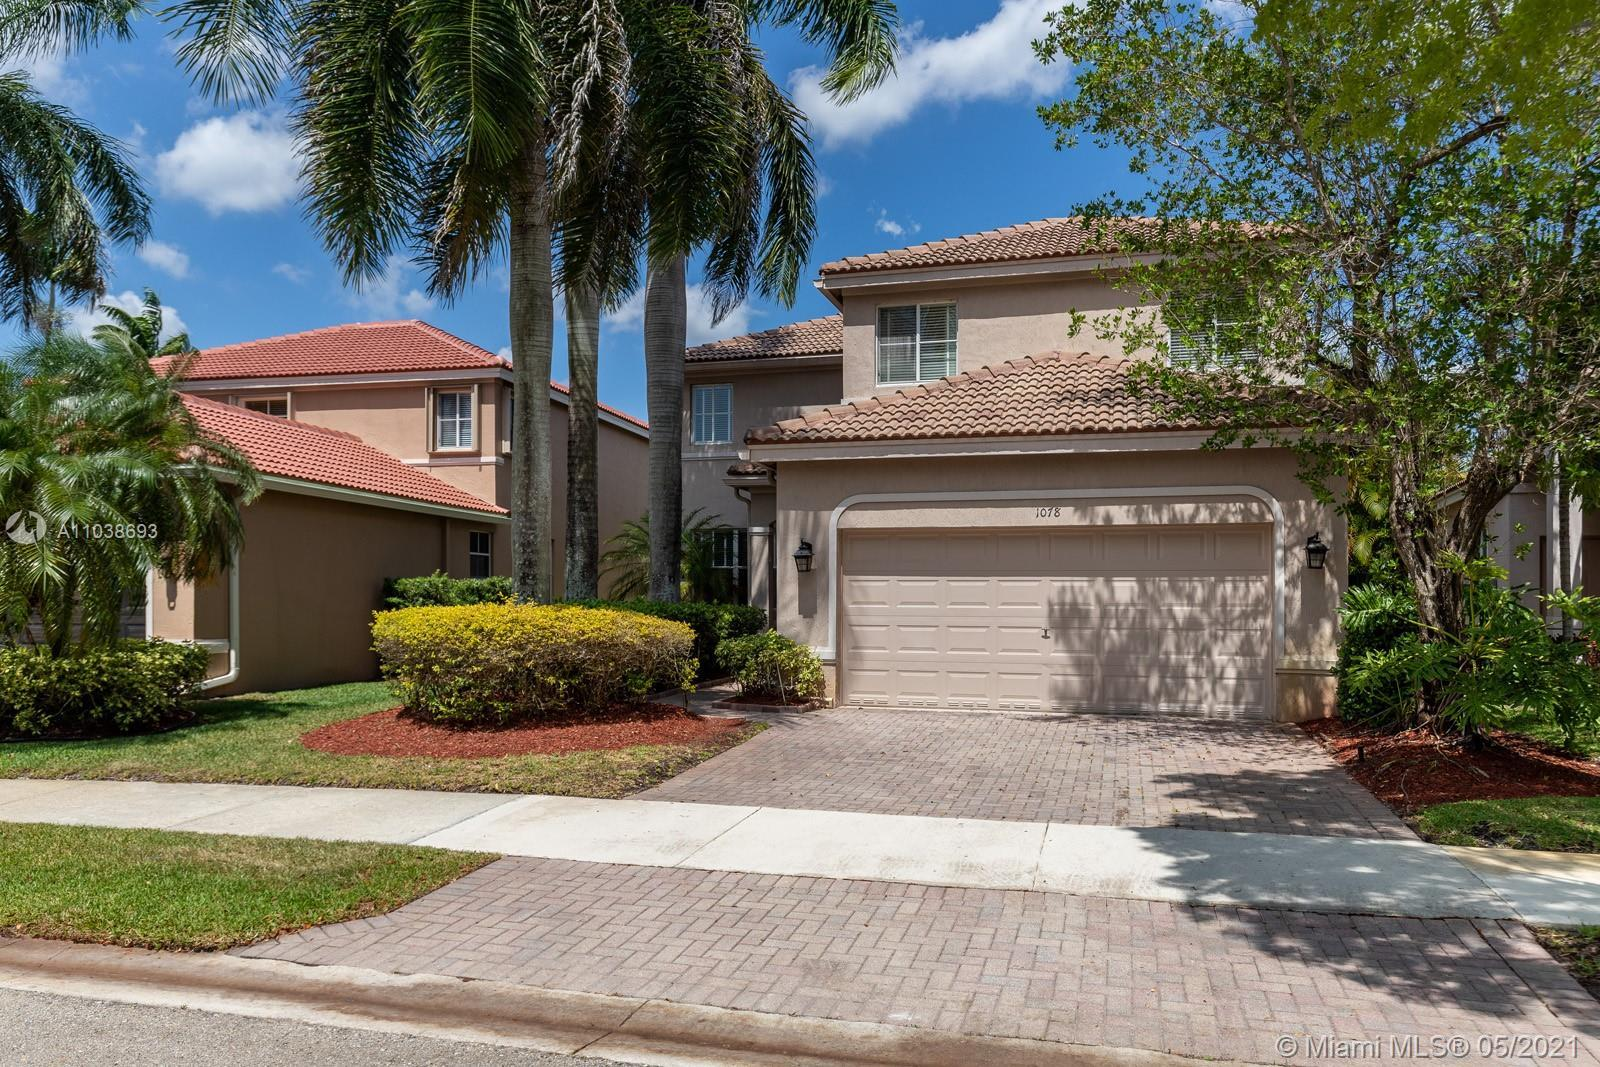 Gorgeous 5/3.5 single family home in Savanna, Weston Florida. This unique property sits on a premium